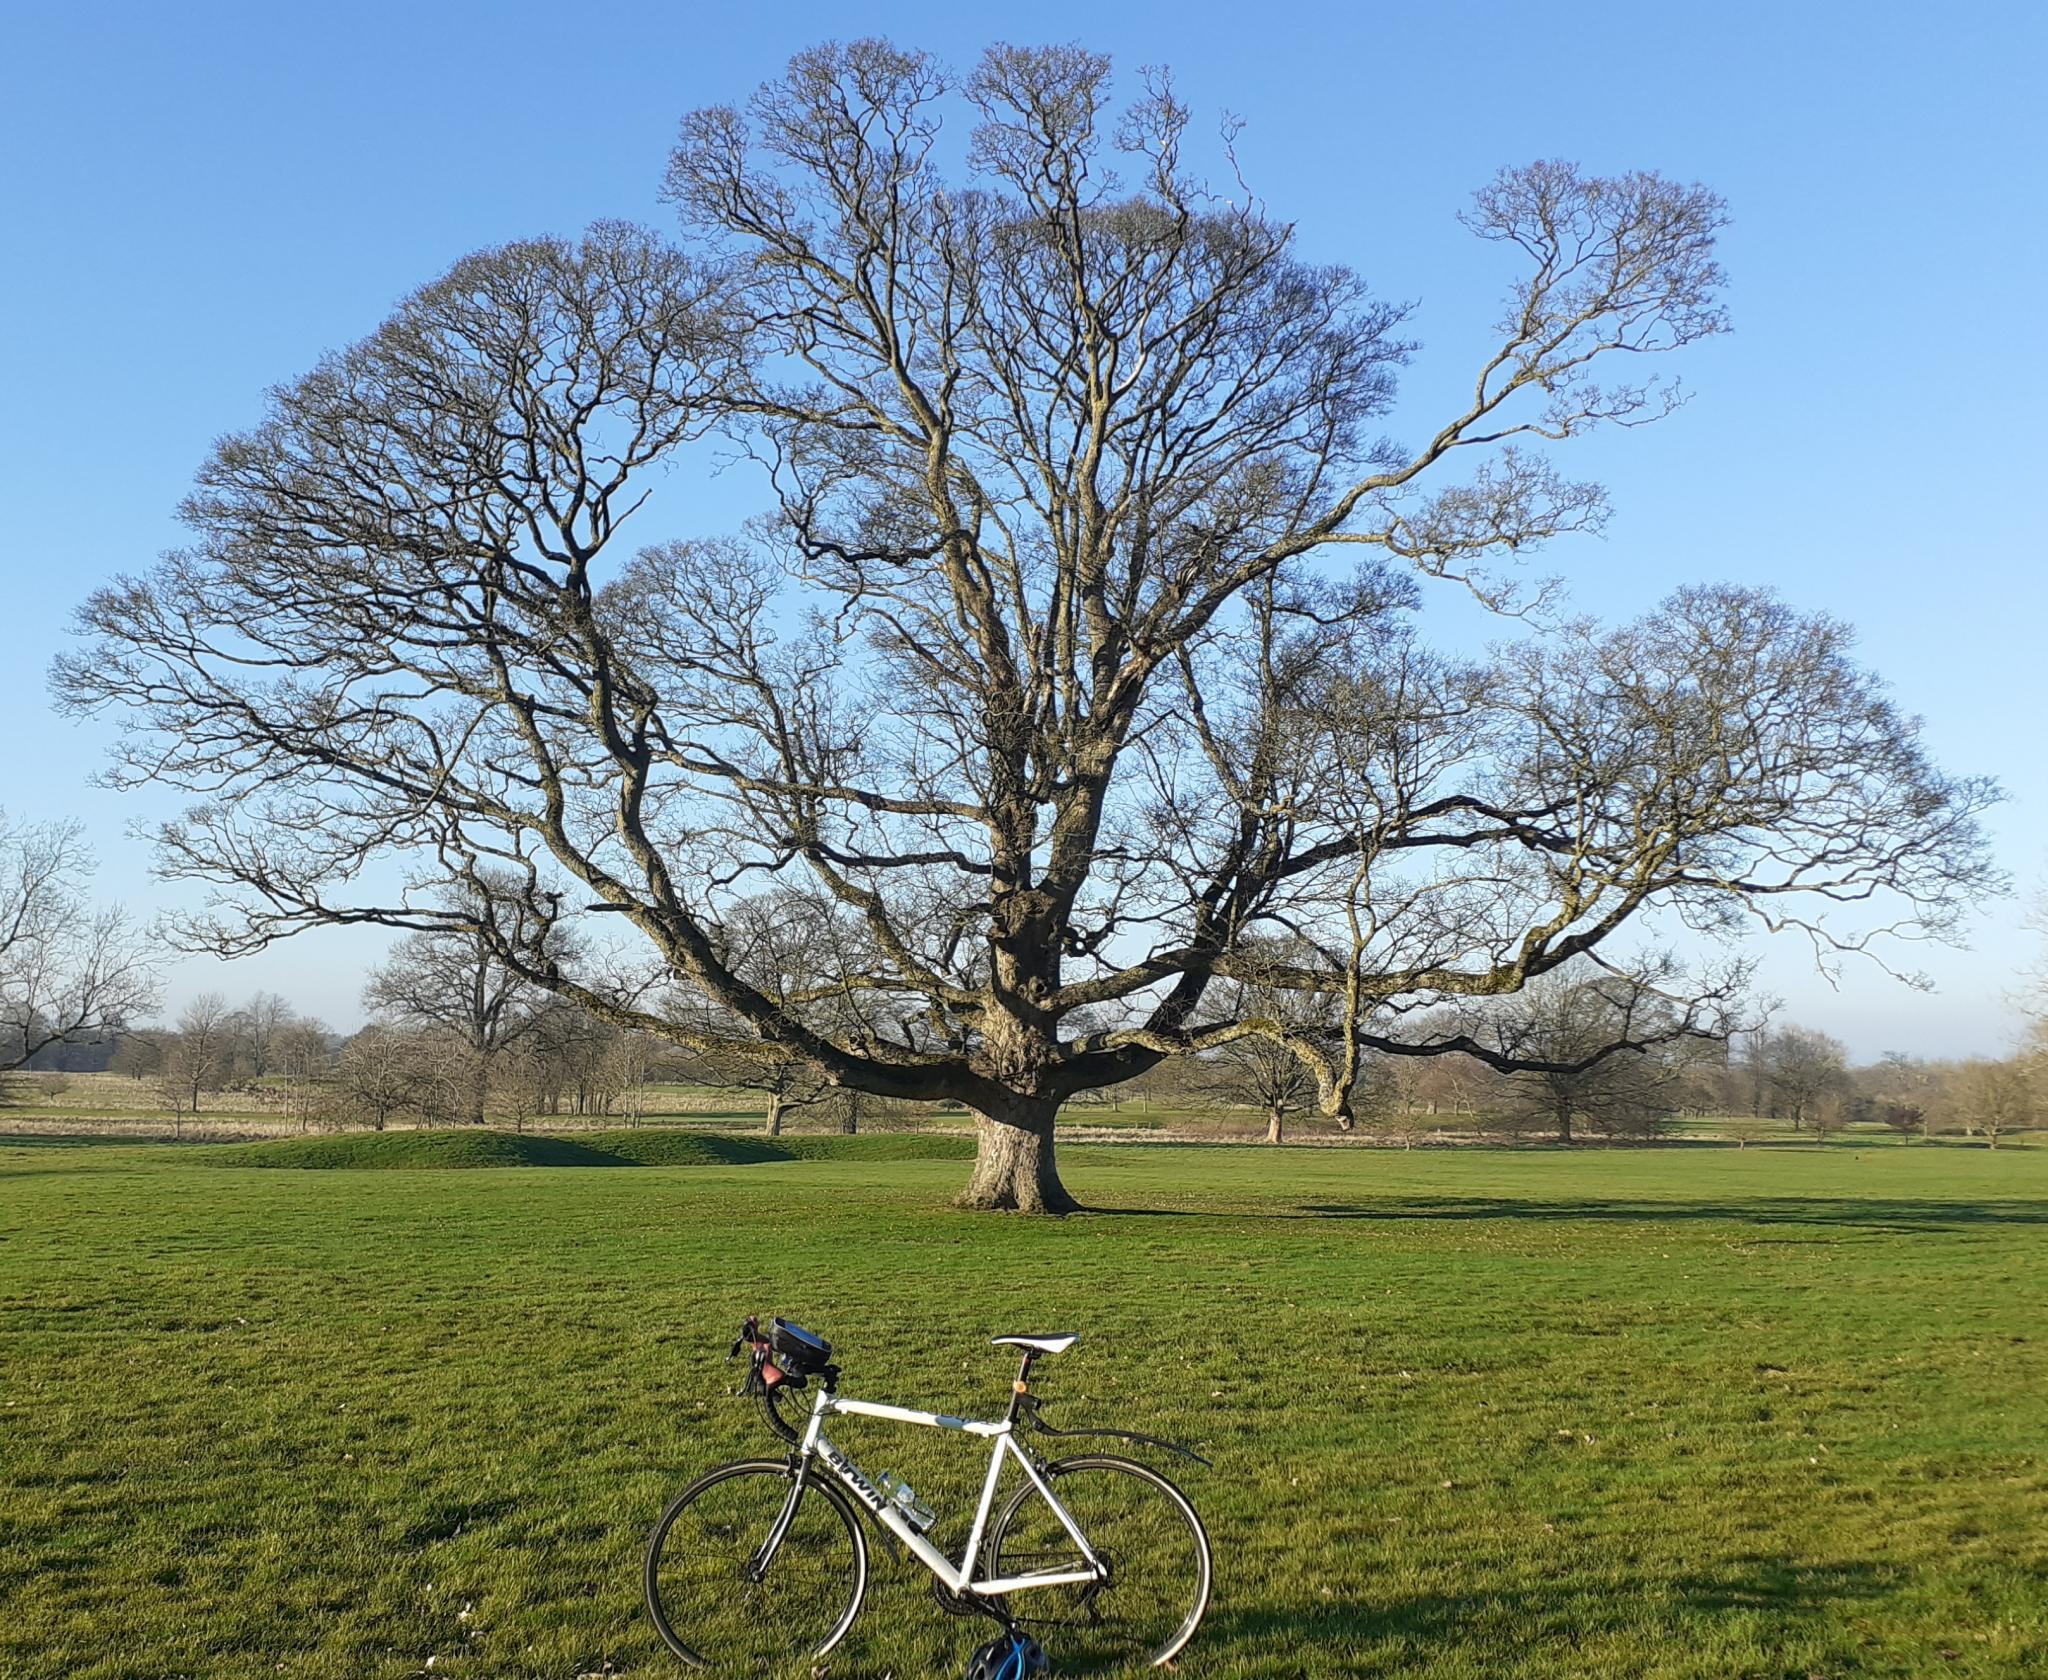 On my bike-20210301_173130-jpg